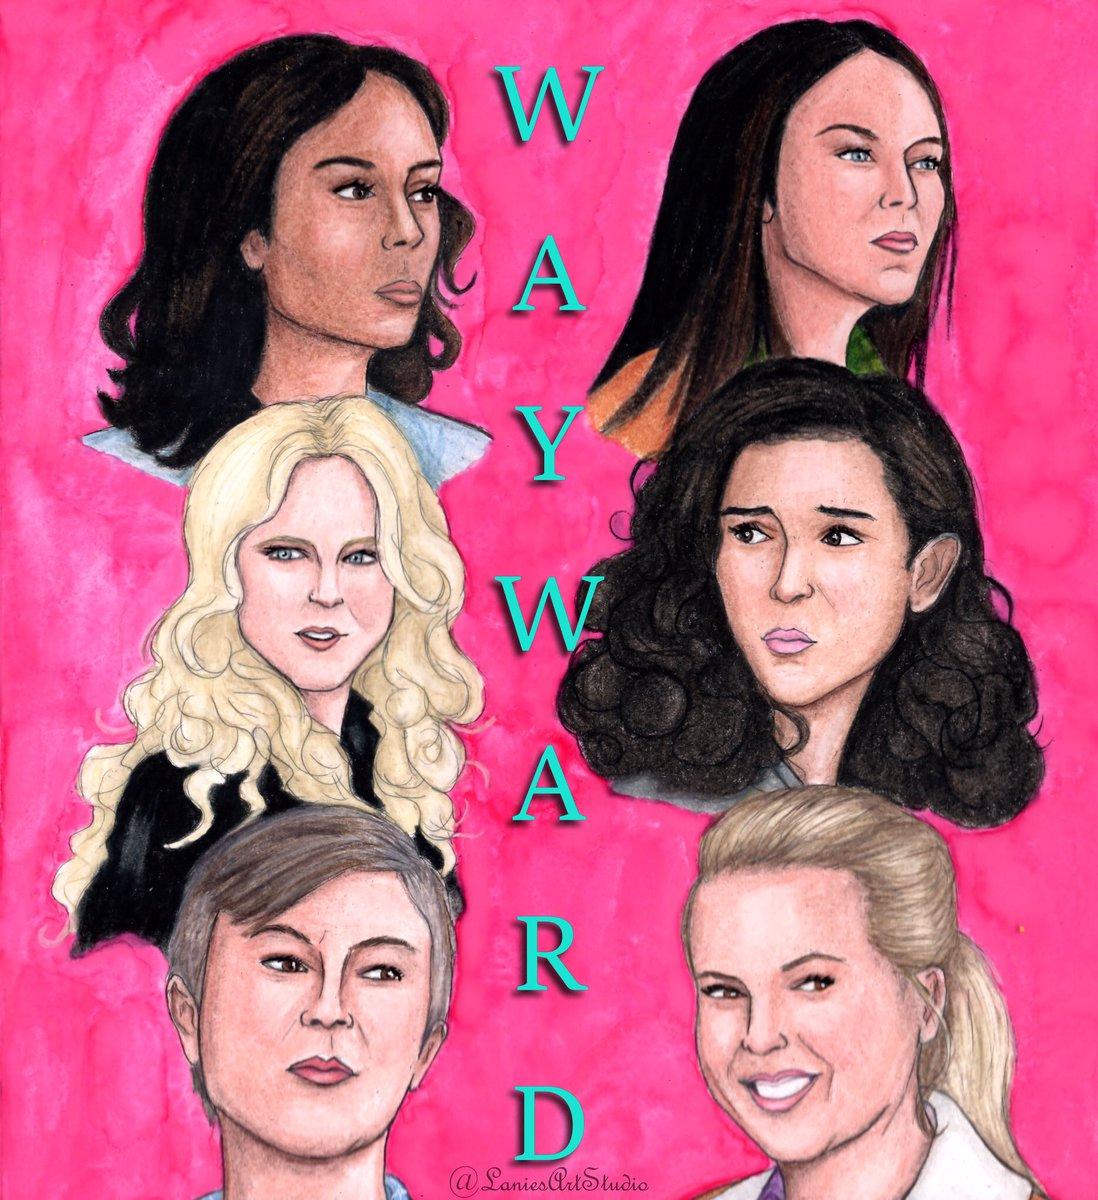 RT @FangirlLanie: These ladies are incredibly inspiring! 💖😊💪  #Wayward #WaywardArtContest @TheCW @cw_spn https://t.co/eTjLCozwet